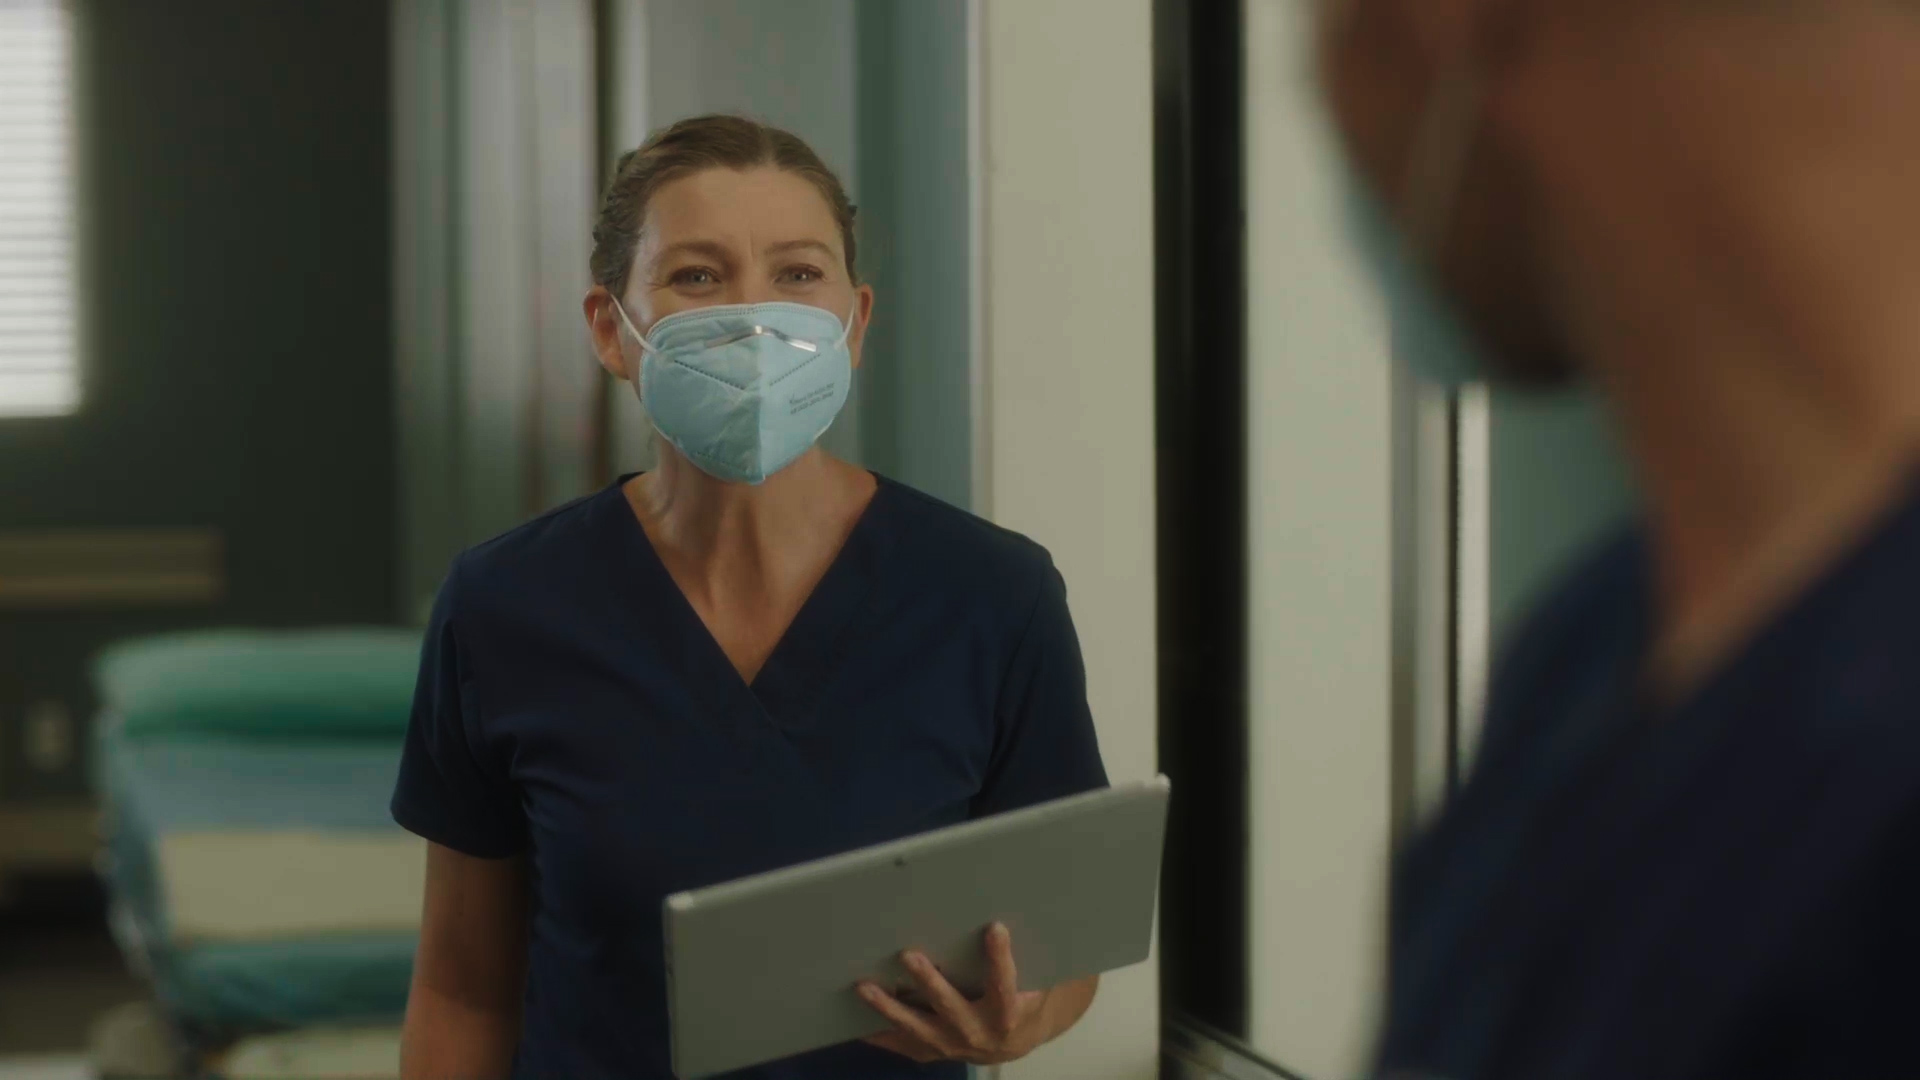 Grey S Anatomy All Tomorrow S Parties Tv Episode 2020 Imdb